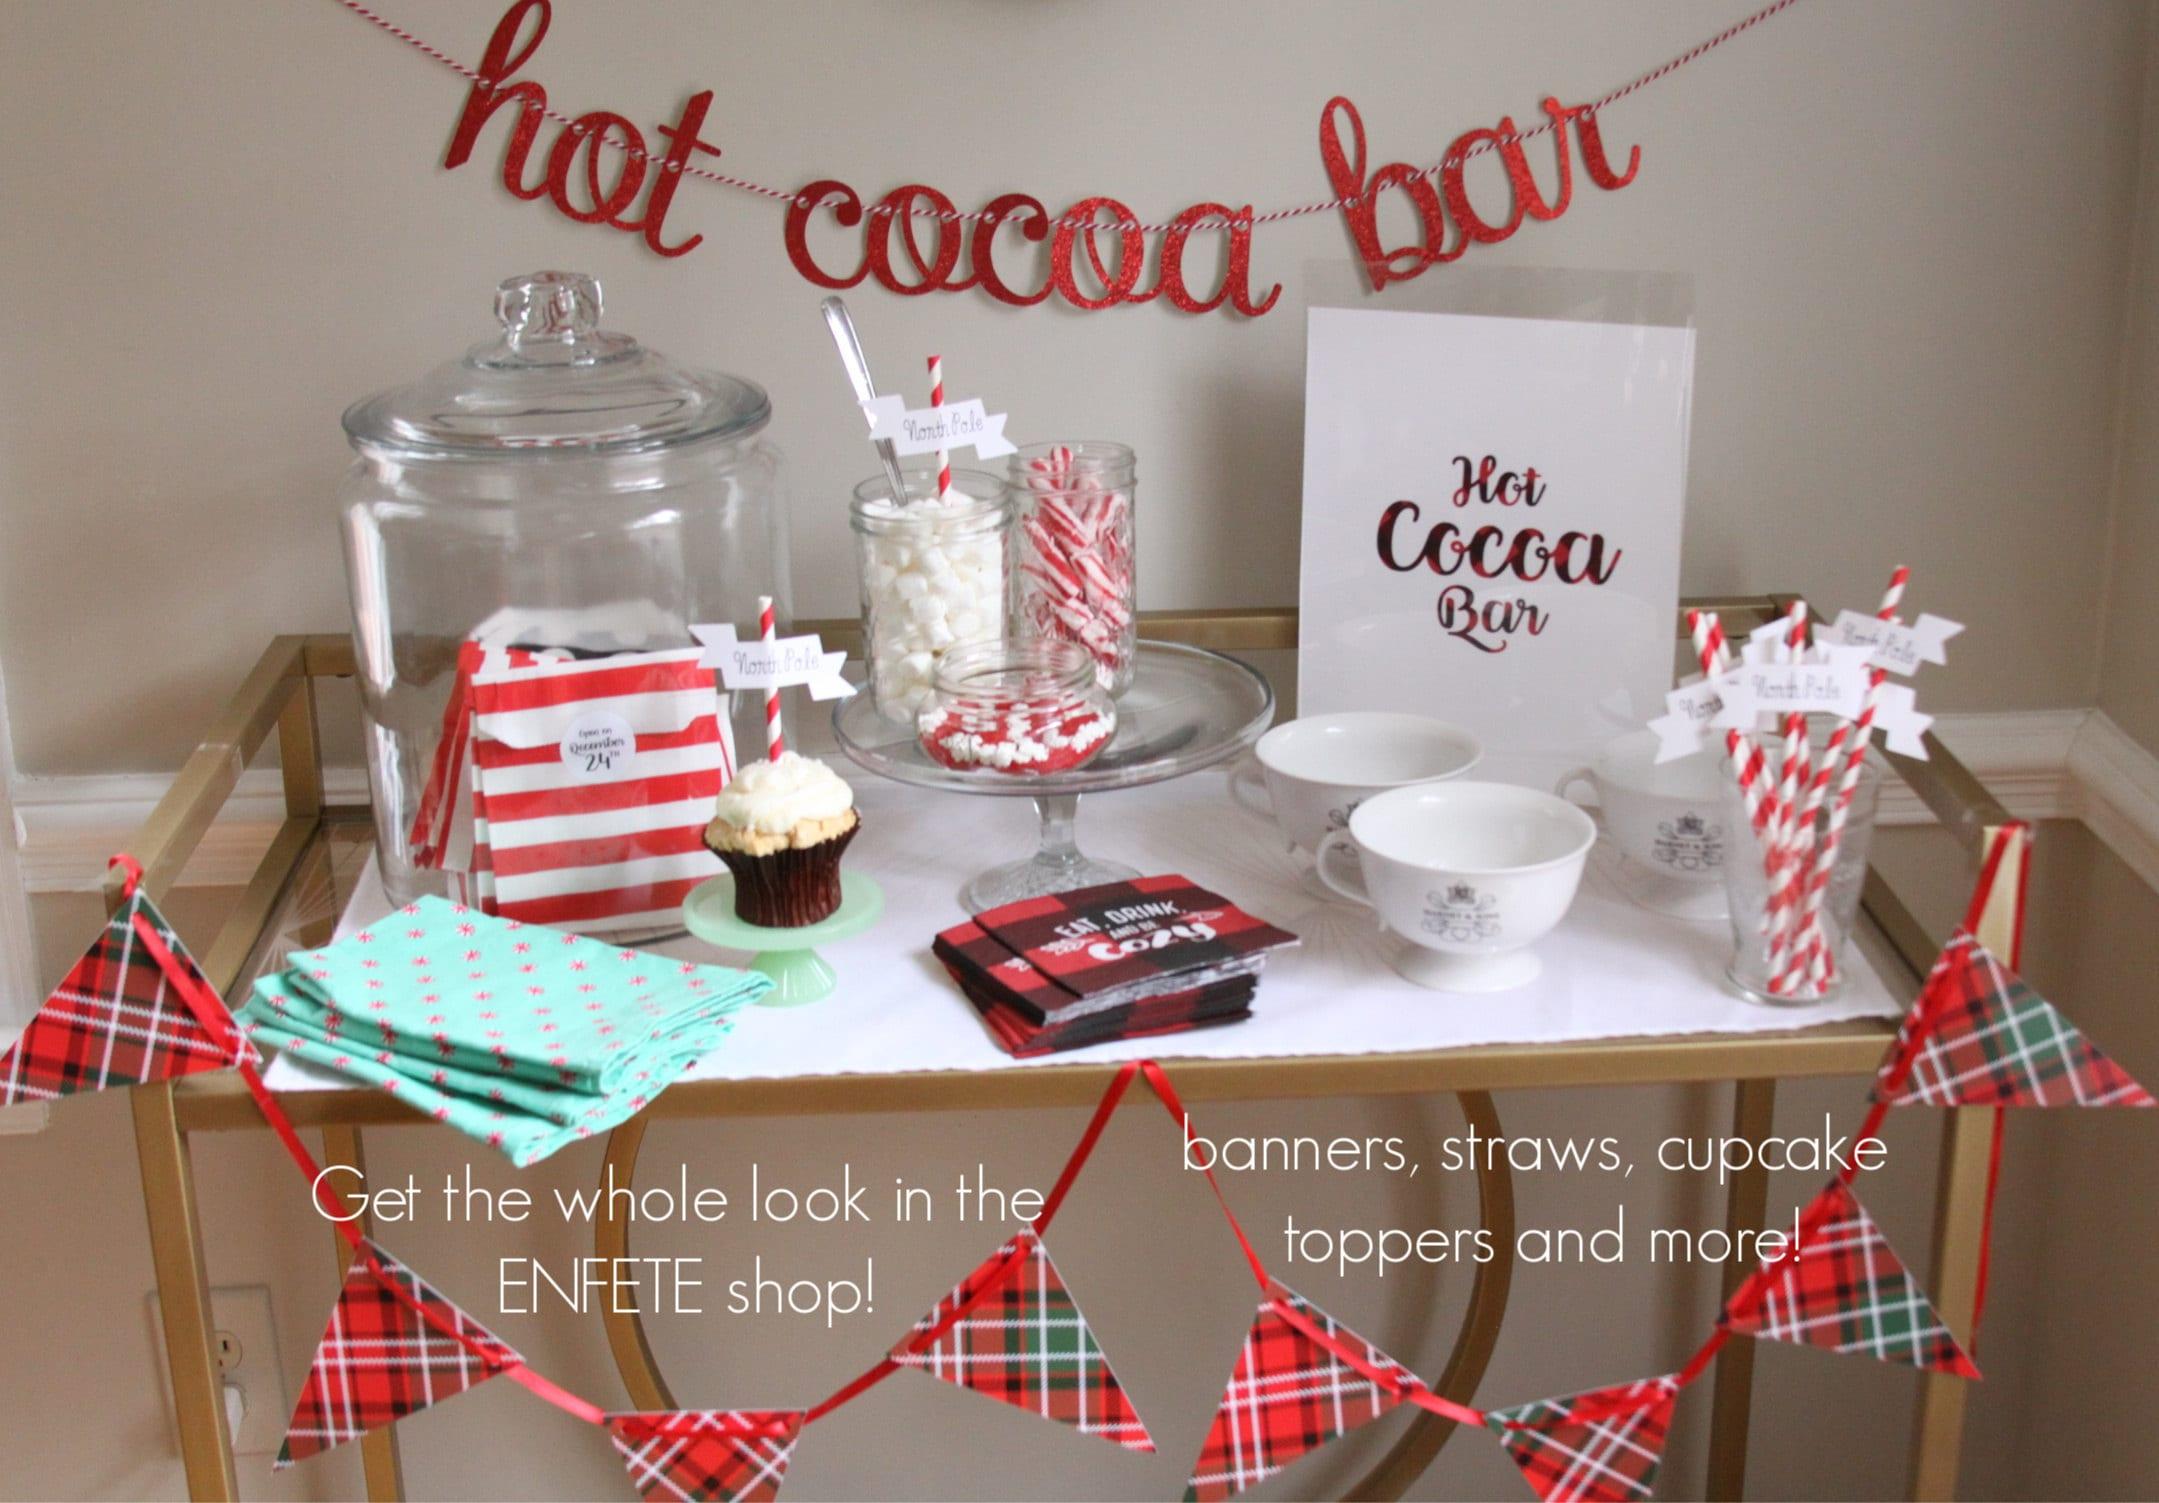 Hot Cocoa Bar Supplies from Enfete